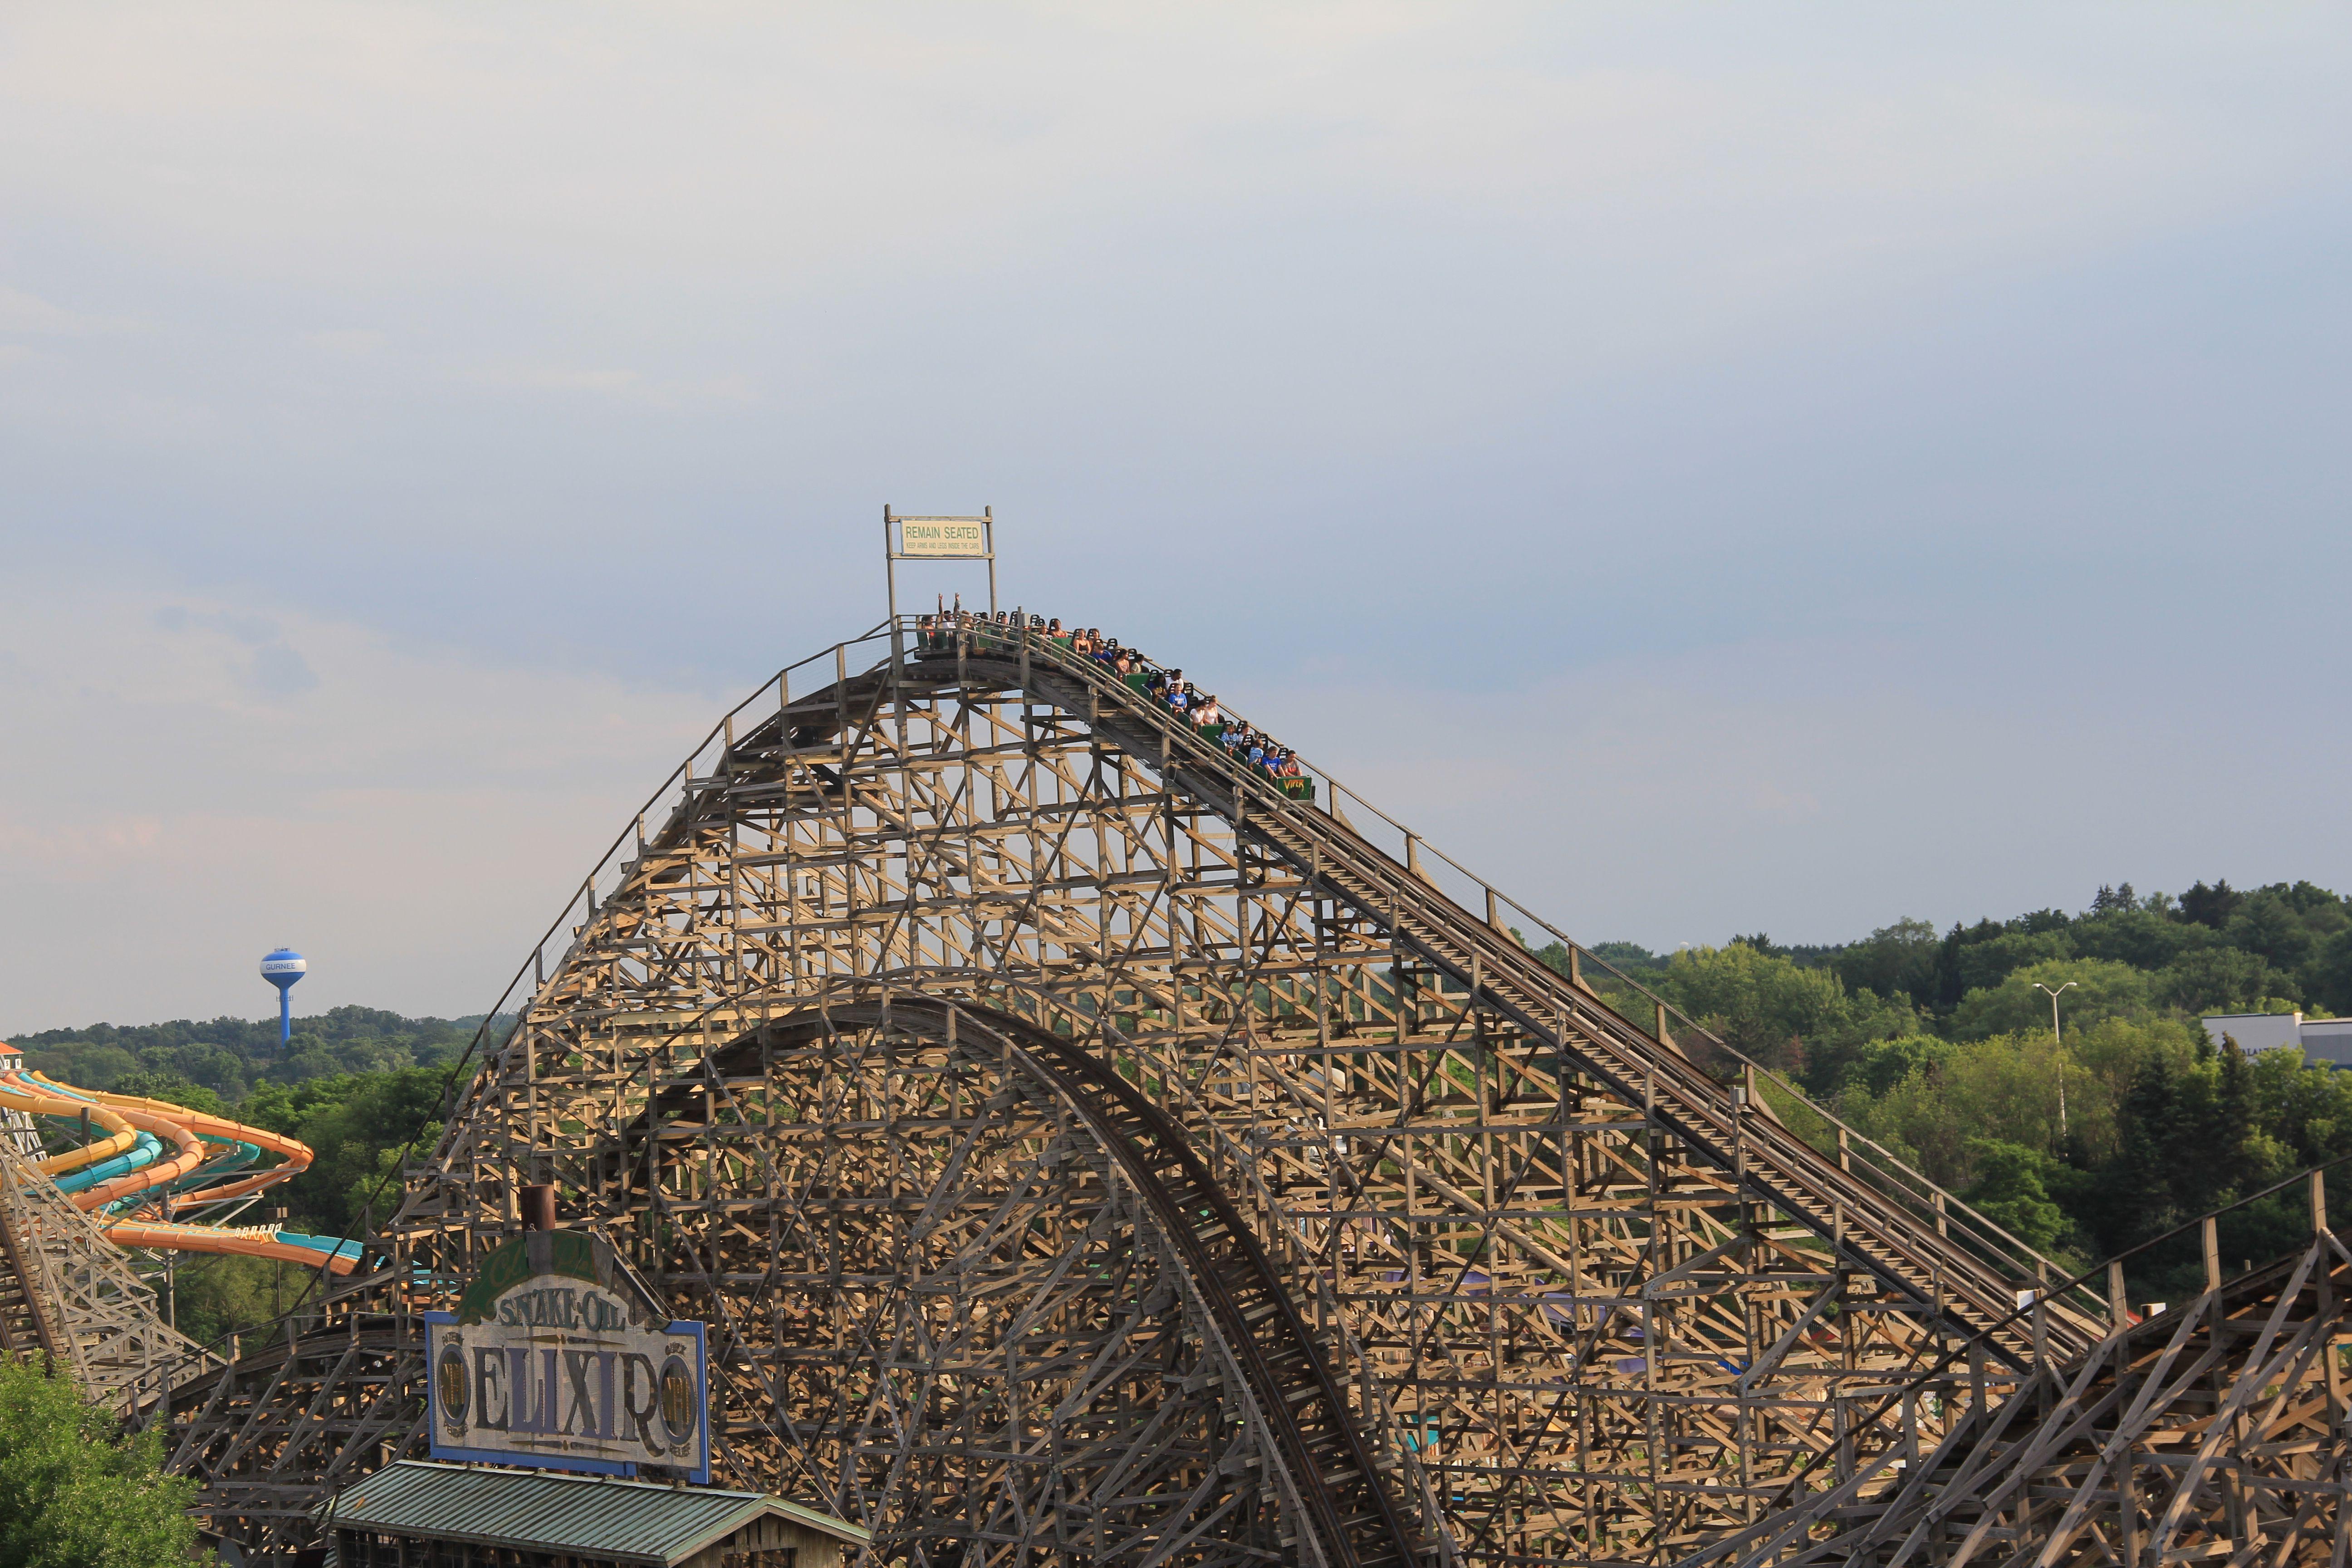 Viper coaster at Six Flags